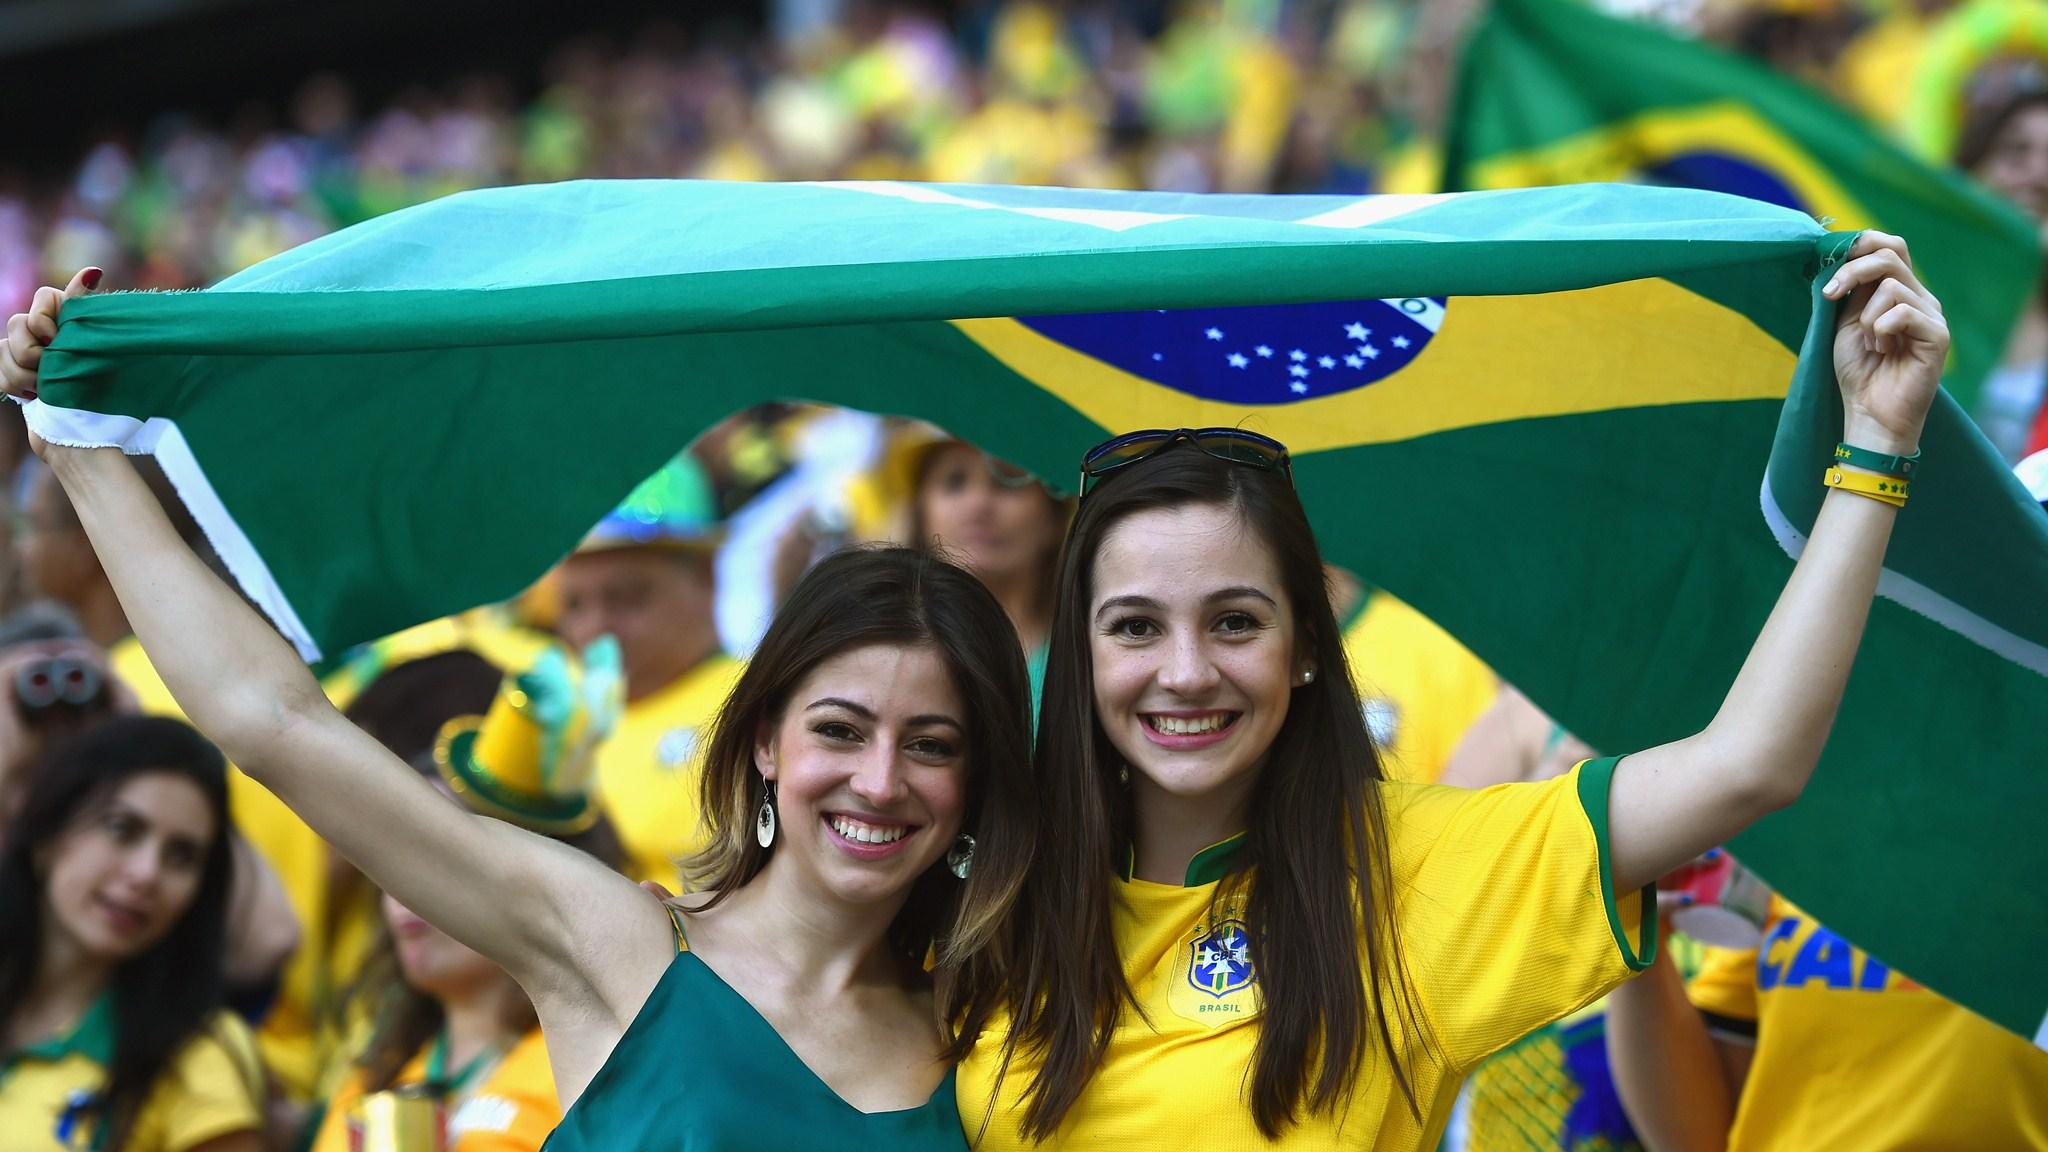 194 - Brazil-Croatia [3-1] -- 12 Jun 2014 - 17-00 -- Sao Paulo - Arena Corinthians